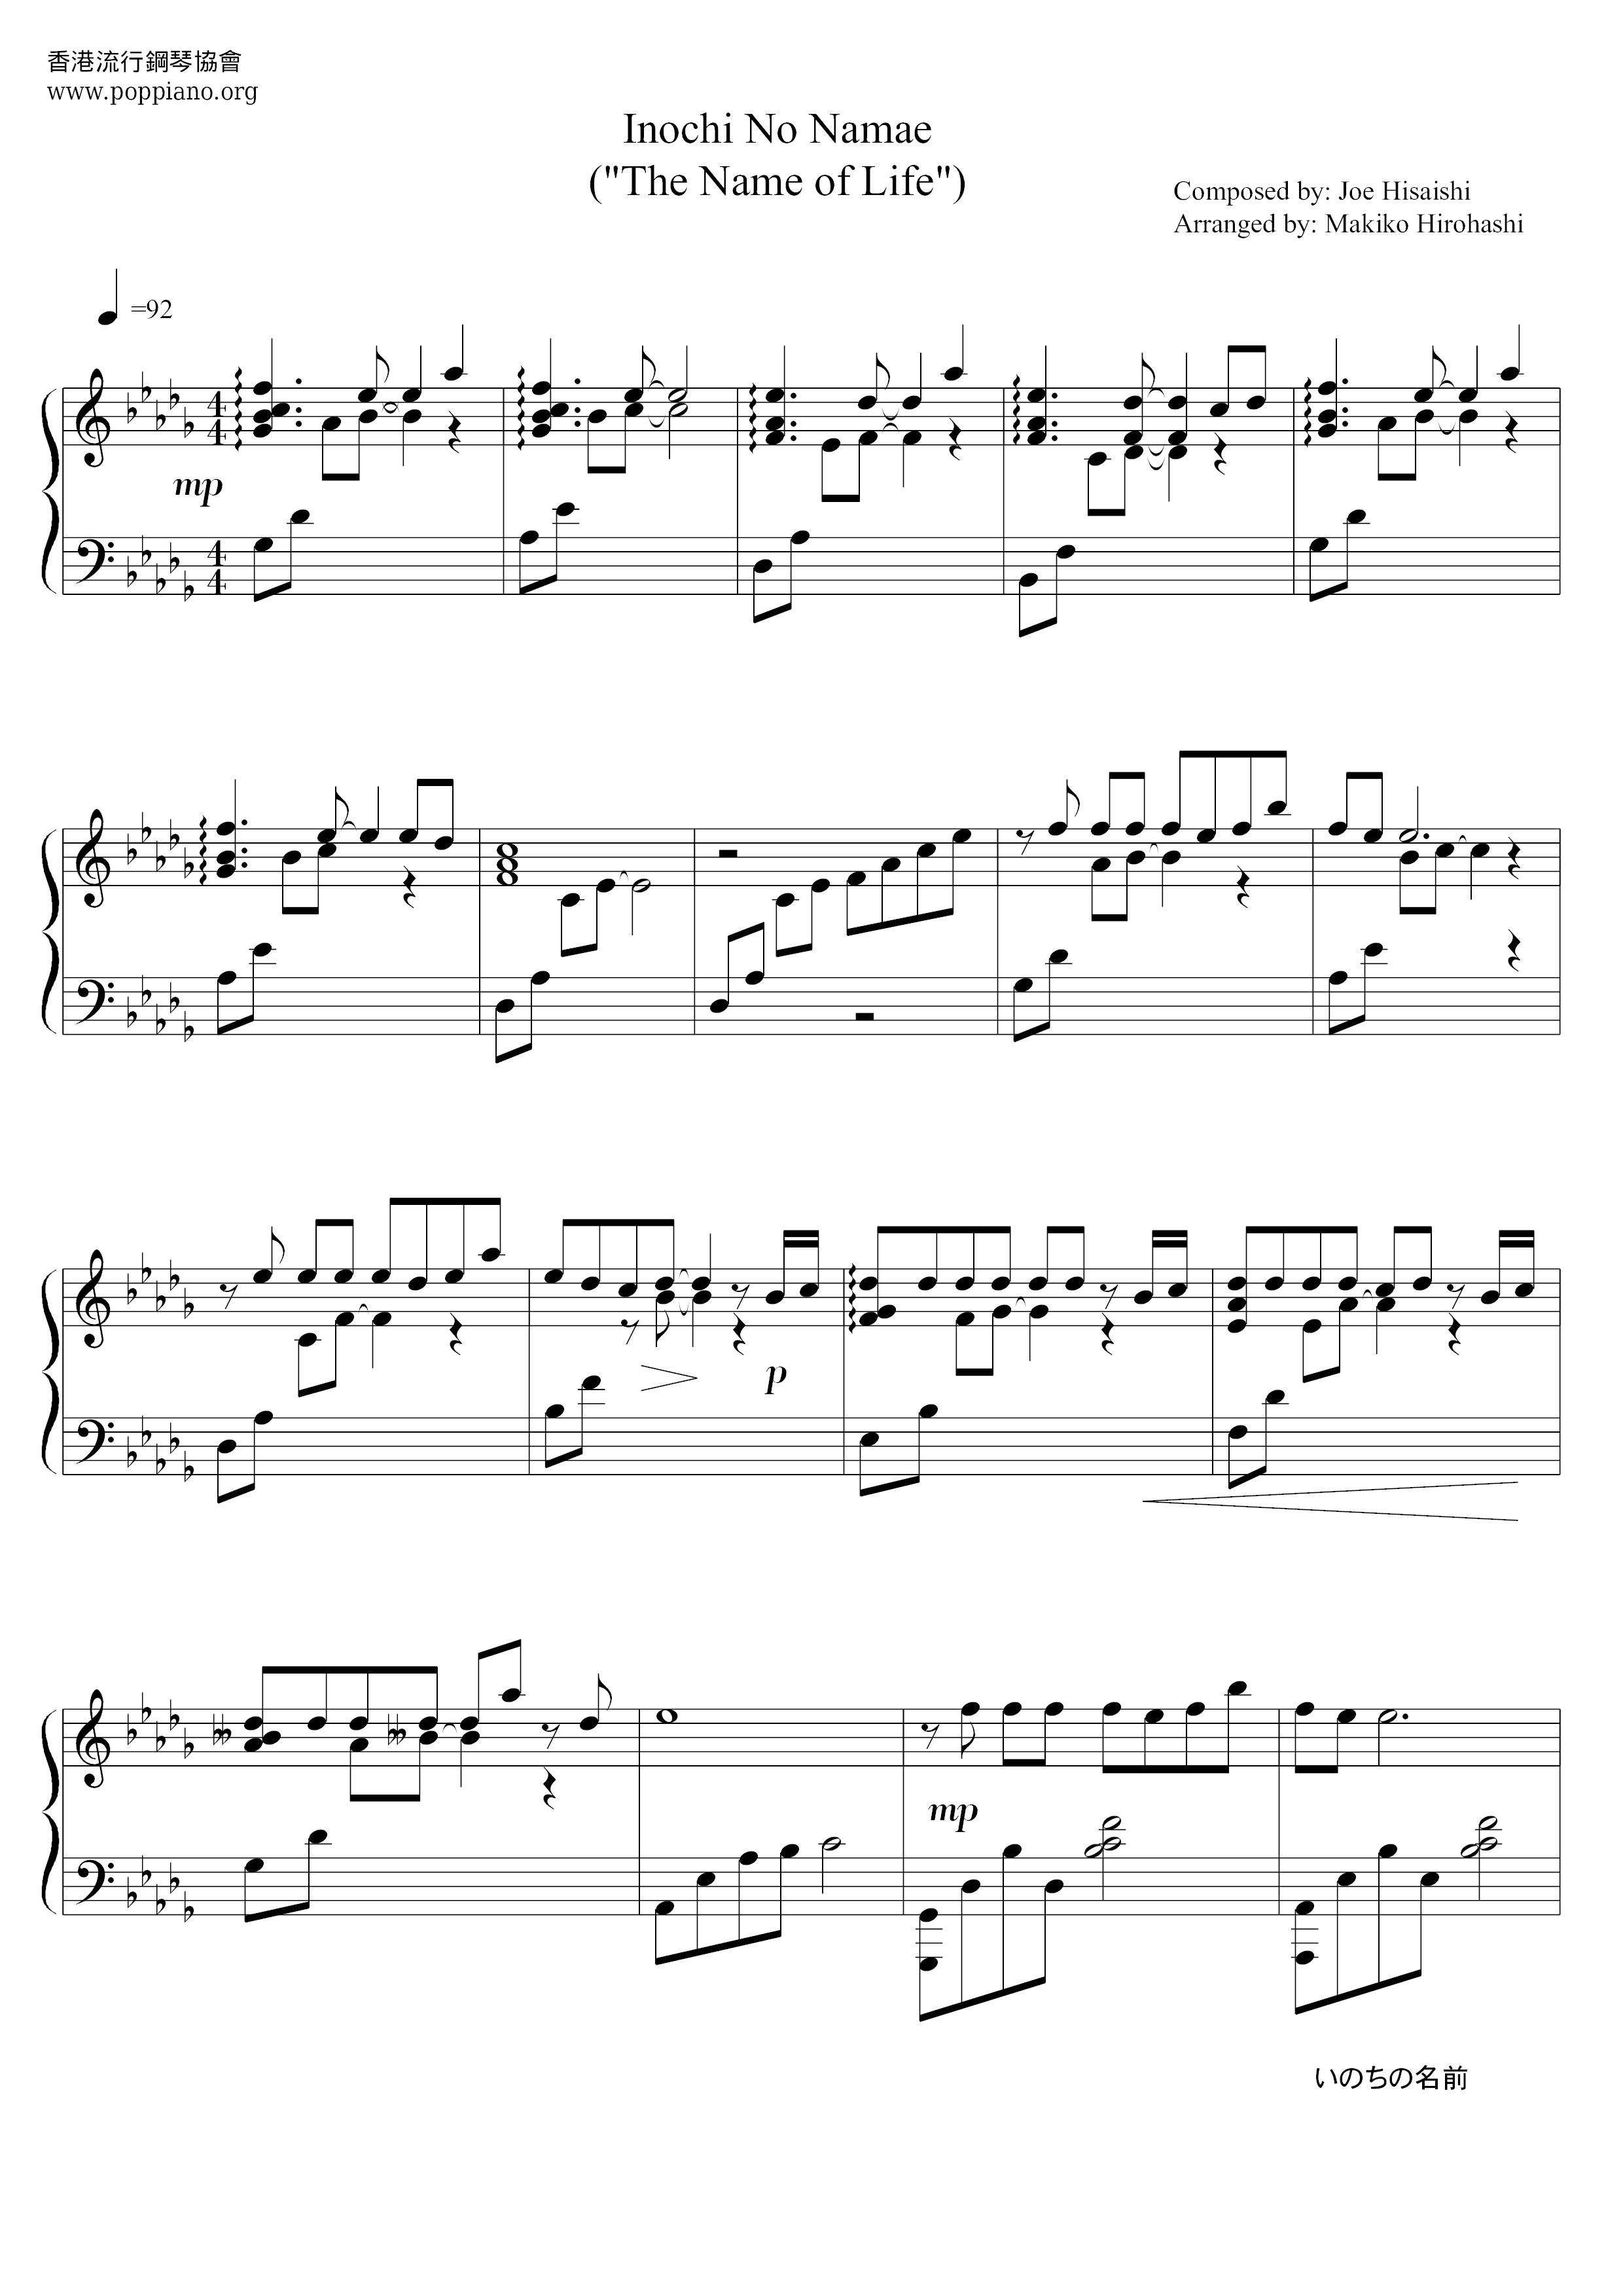 名前 楽譜 の いのち